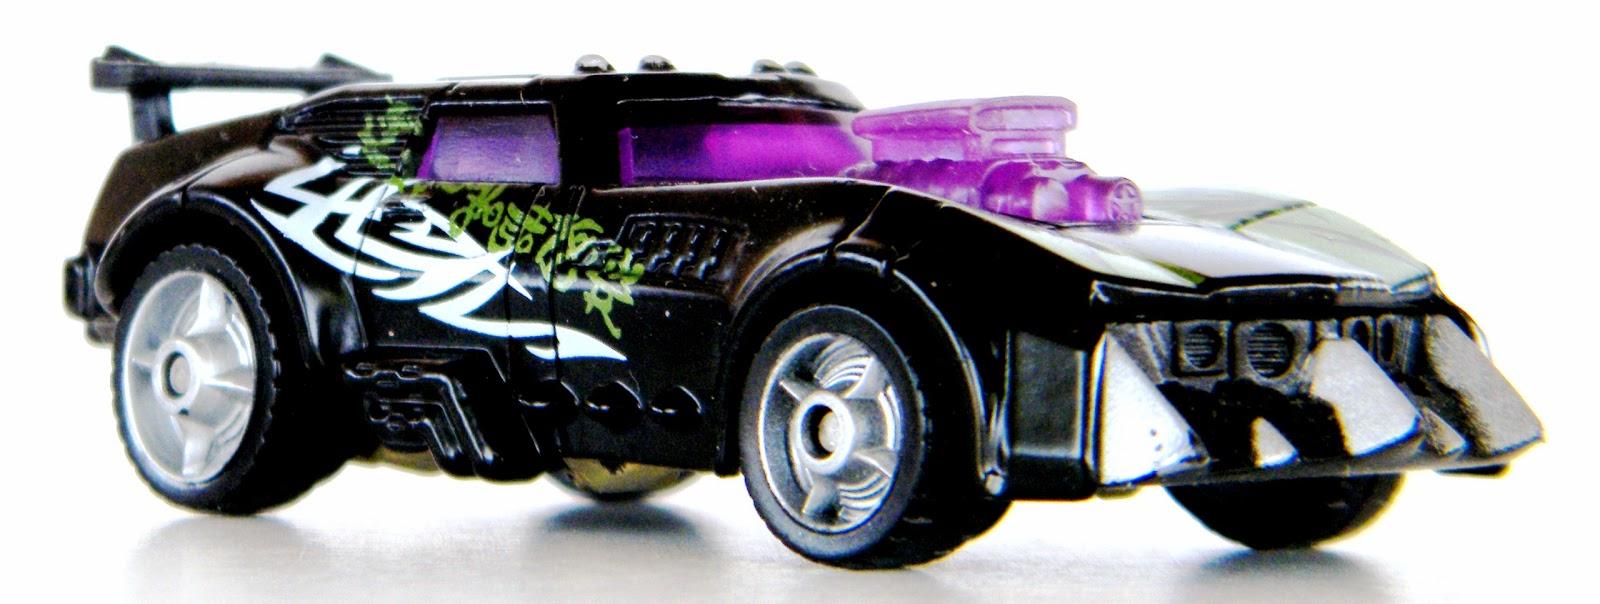 Toys and Stuff: Hasbro 2010 #10961 Transformers - Lockdown